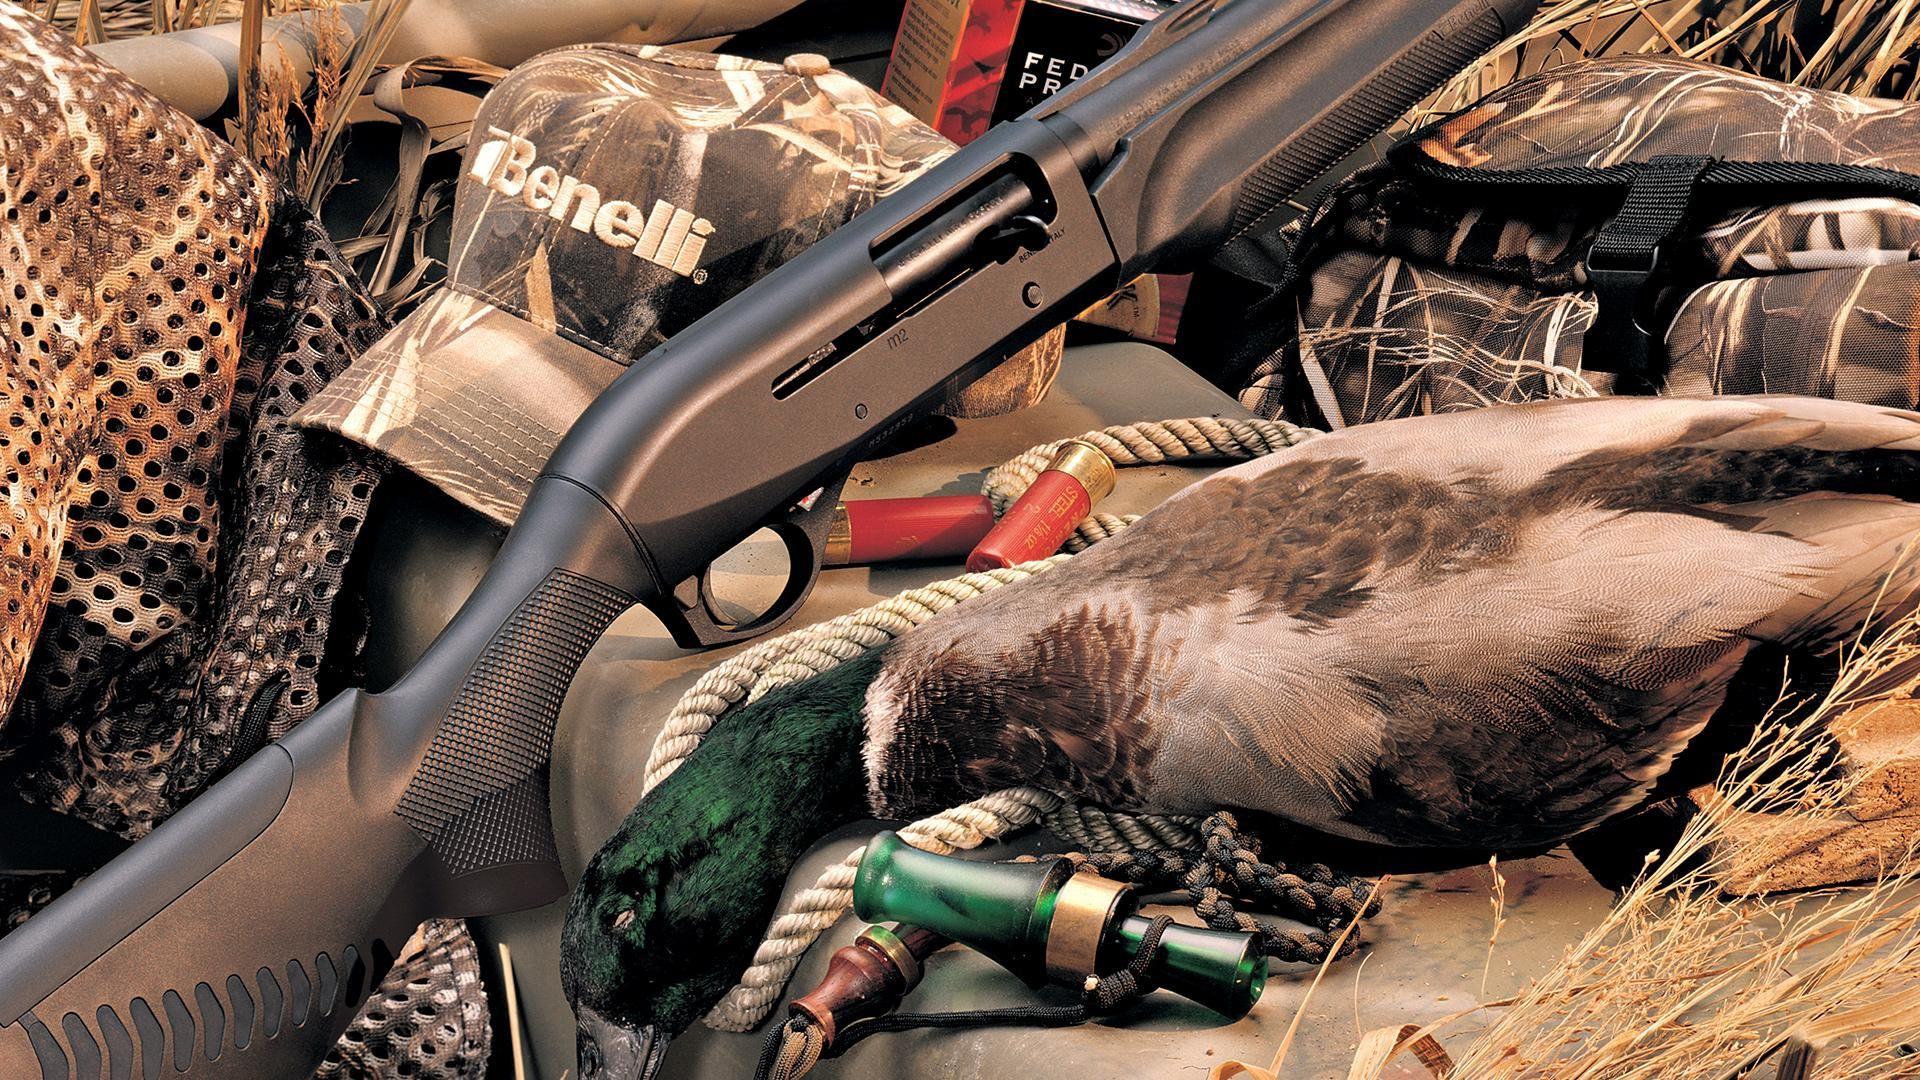 Wallpaper, computer, birds, hunted, rifle, hunting